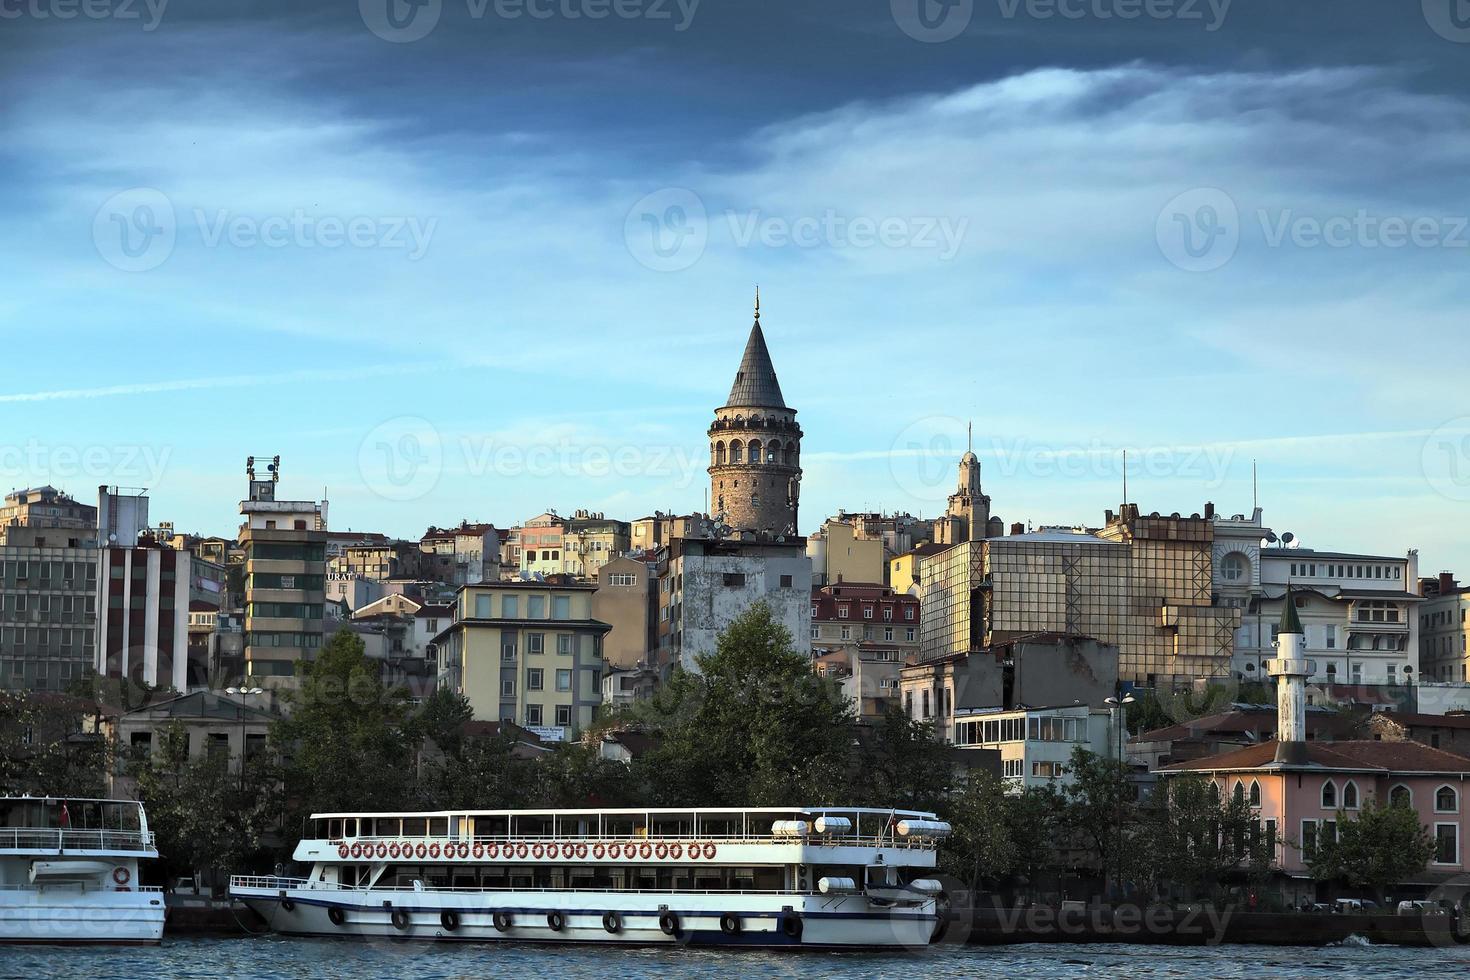 Galata tower - Istanbul sea front view, Bosporus, Turkey. photo